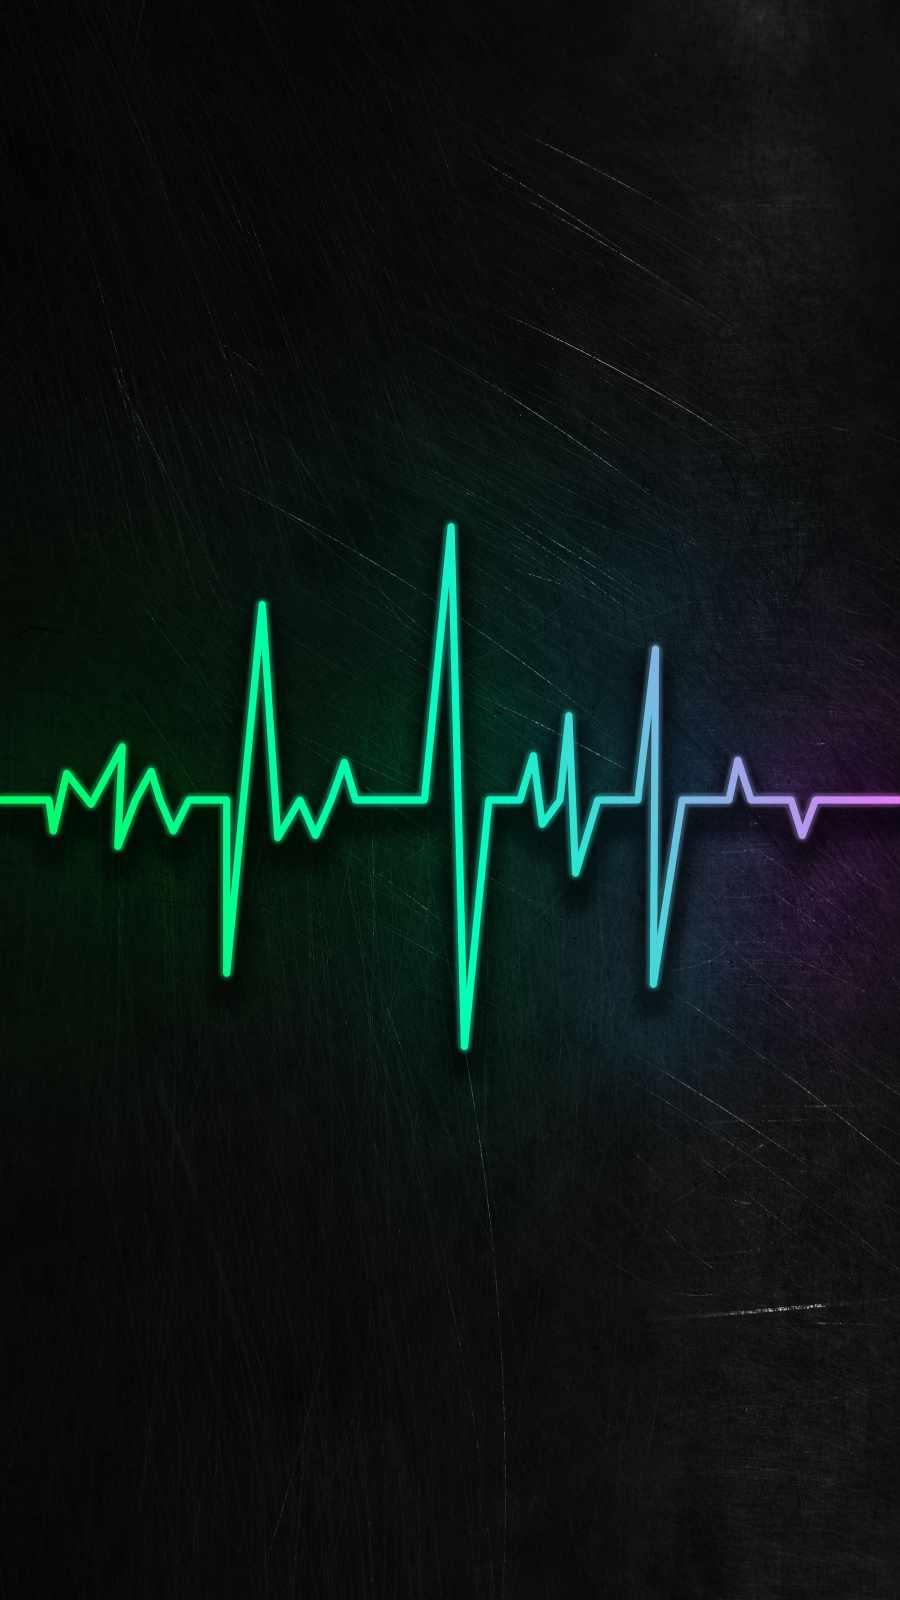 Heartbeat Neon iPhone Wallpaper